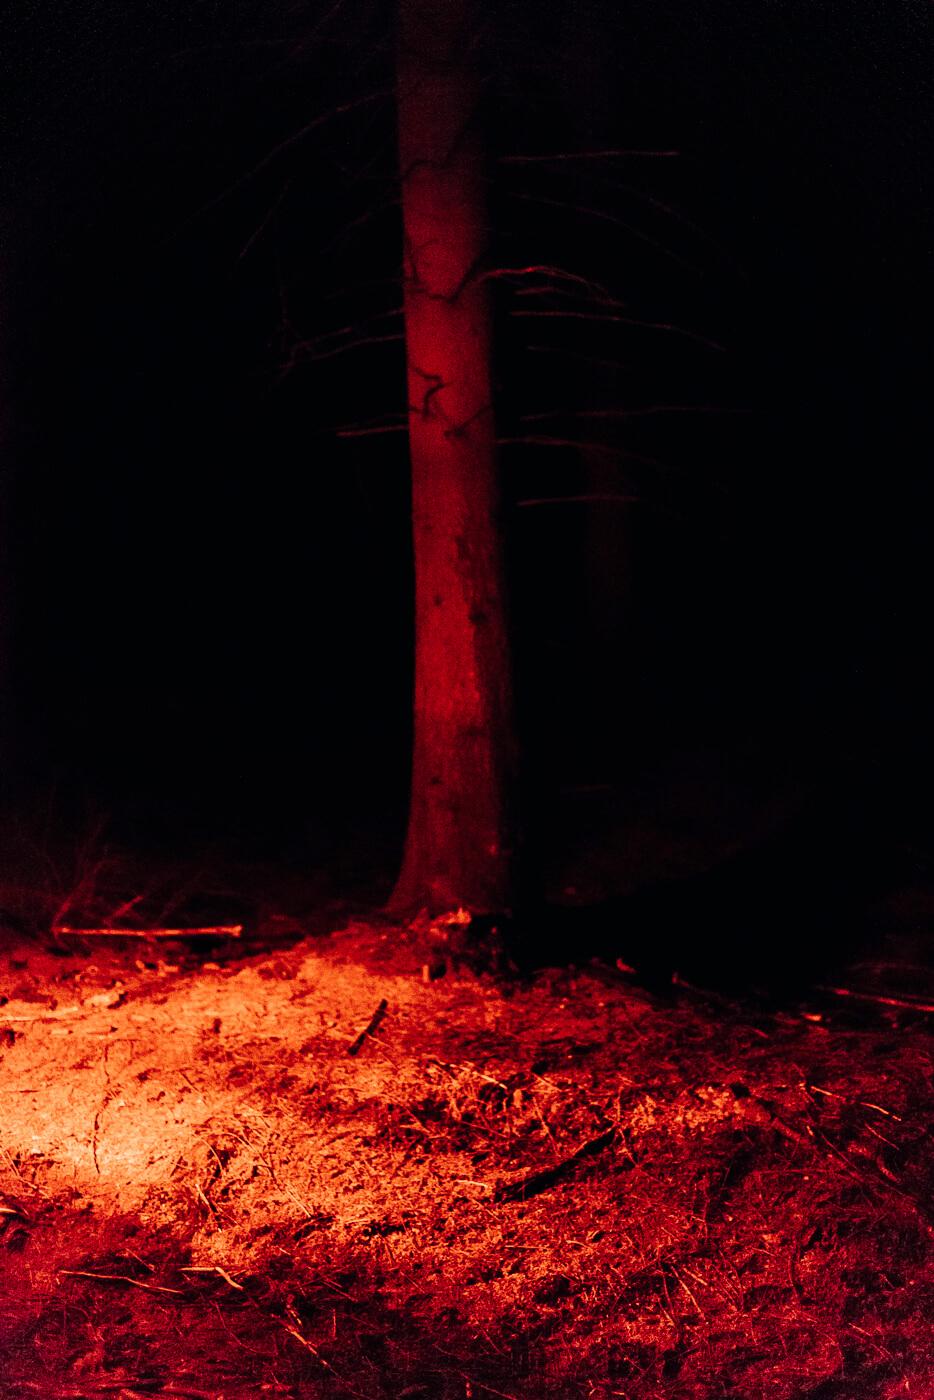 Büchsenlicht Fotohof Dokumentarfotografie Milan Soremski Soremski Design, Fotografie und Film